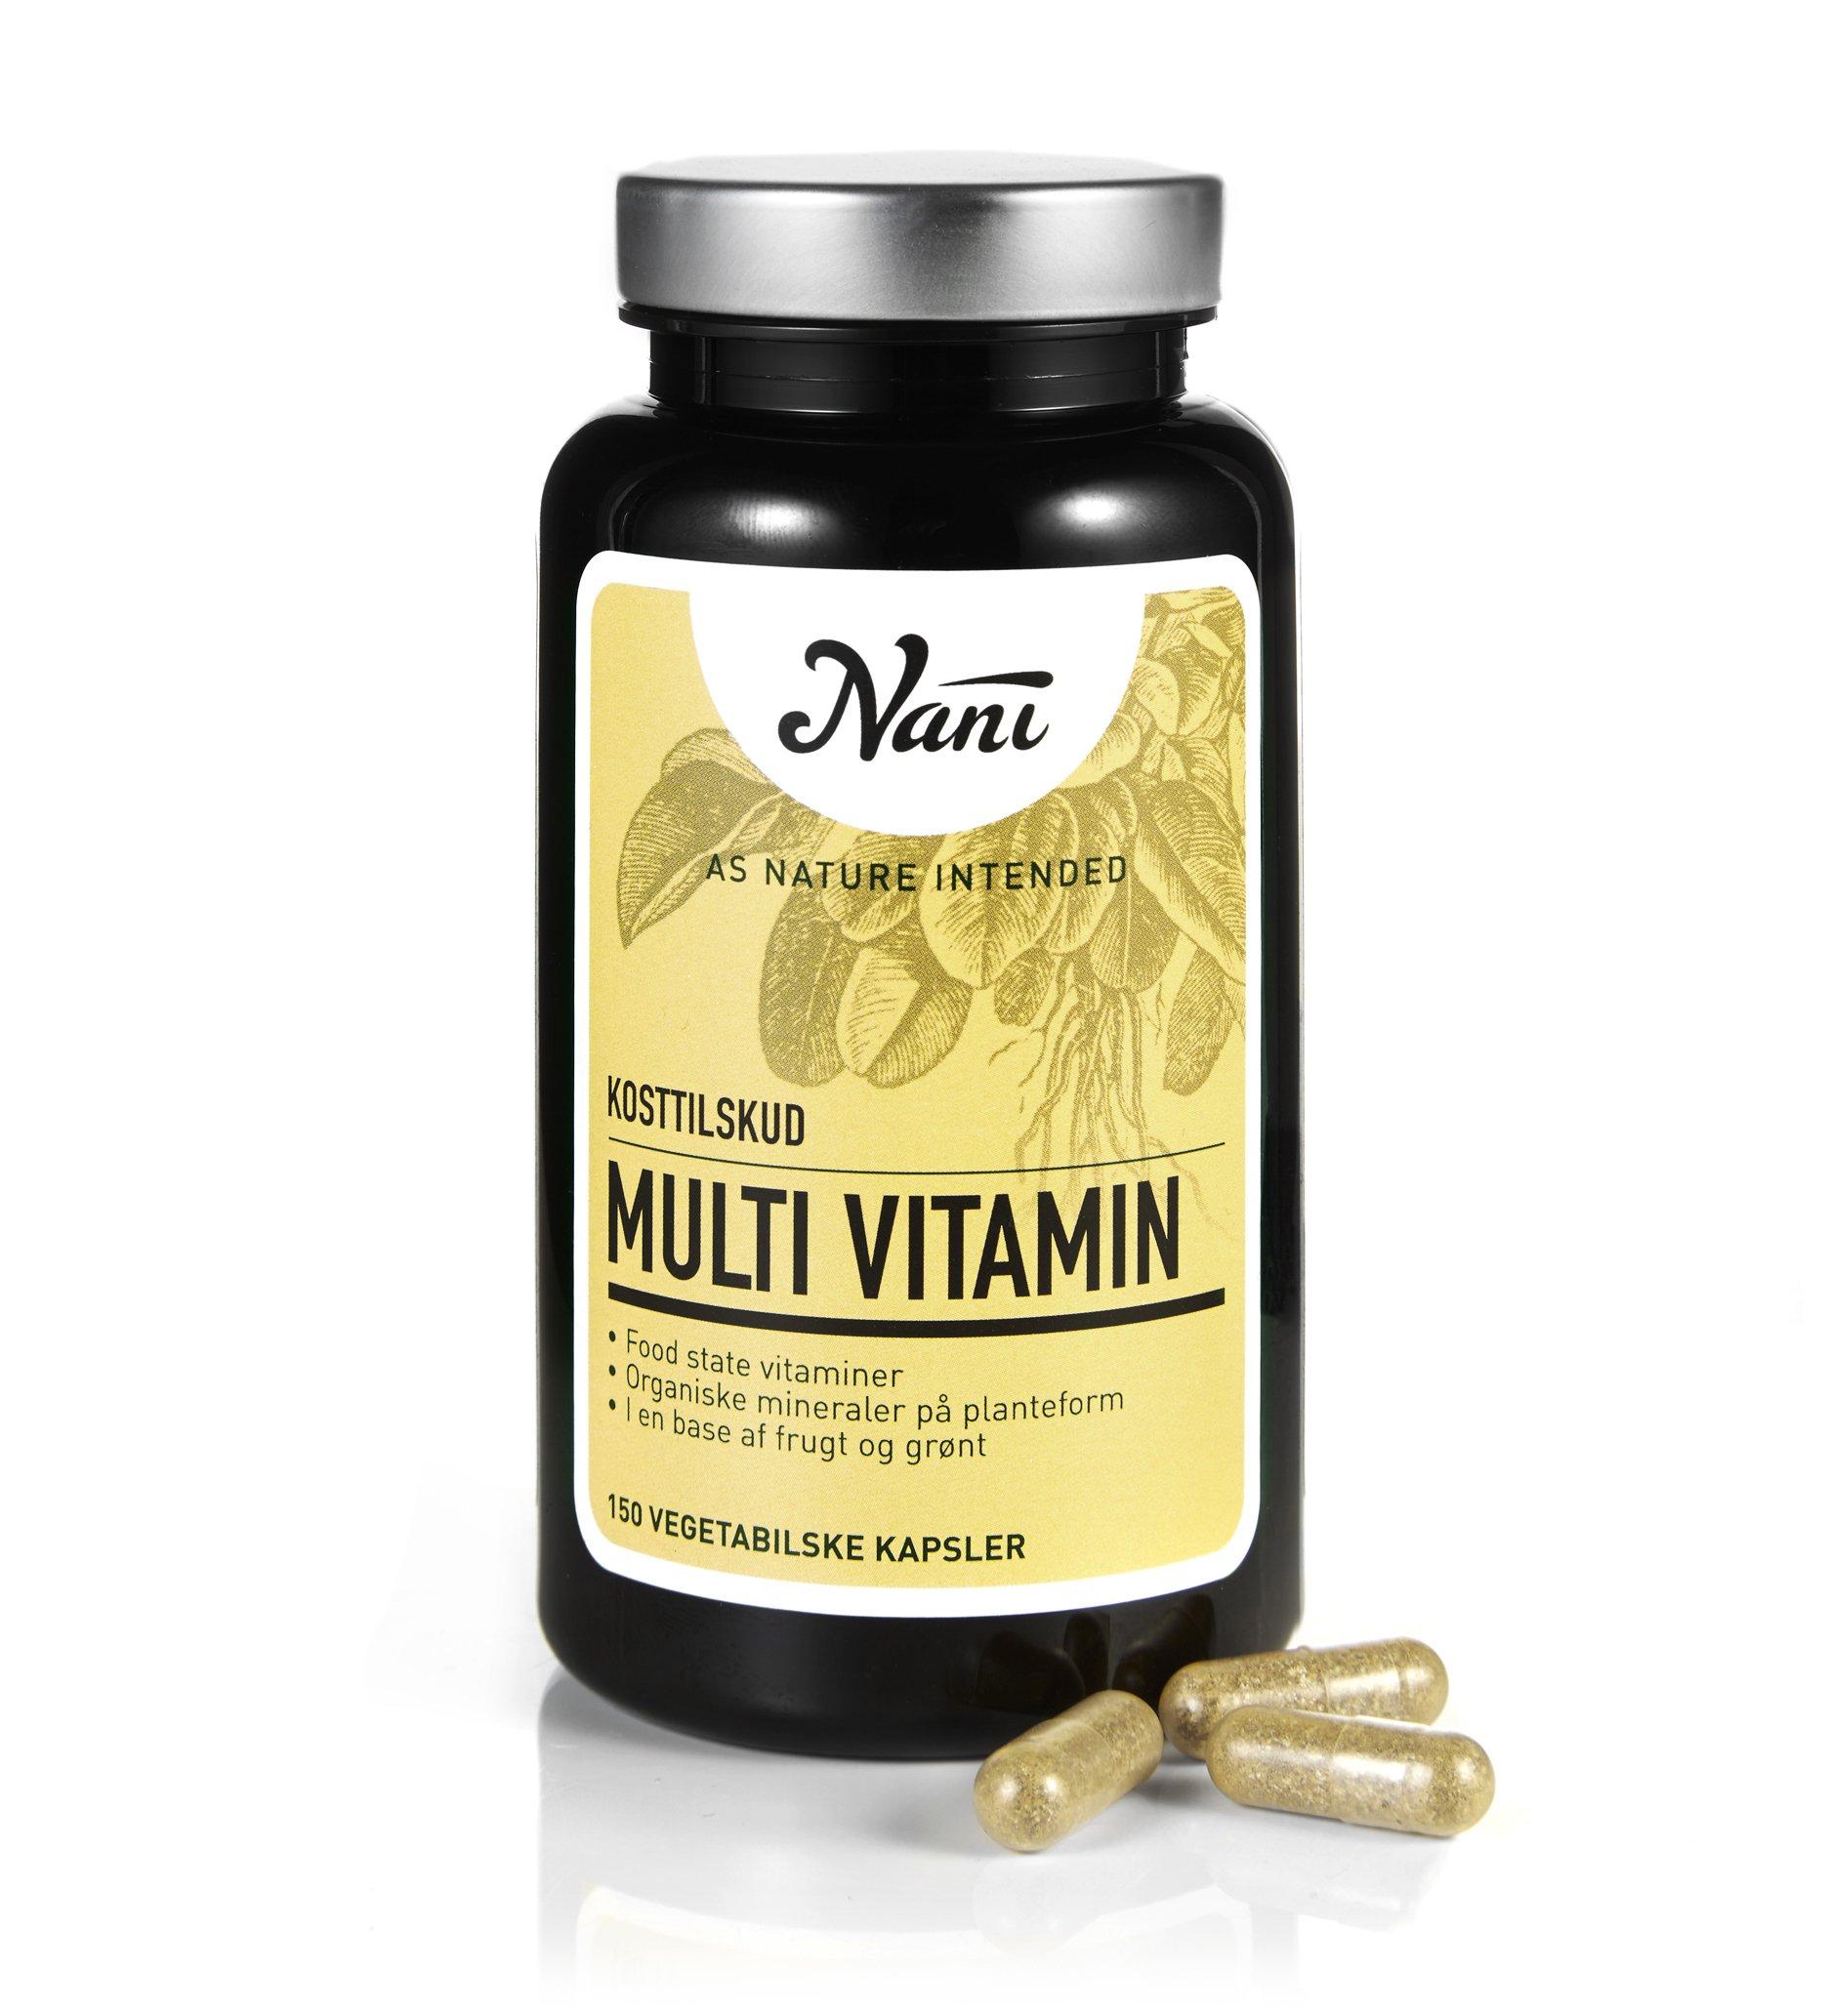 Nani Multi Vitamin